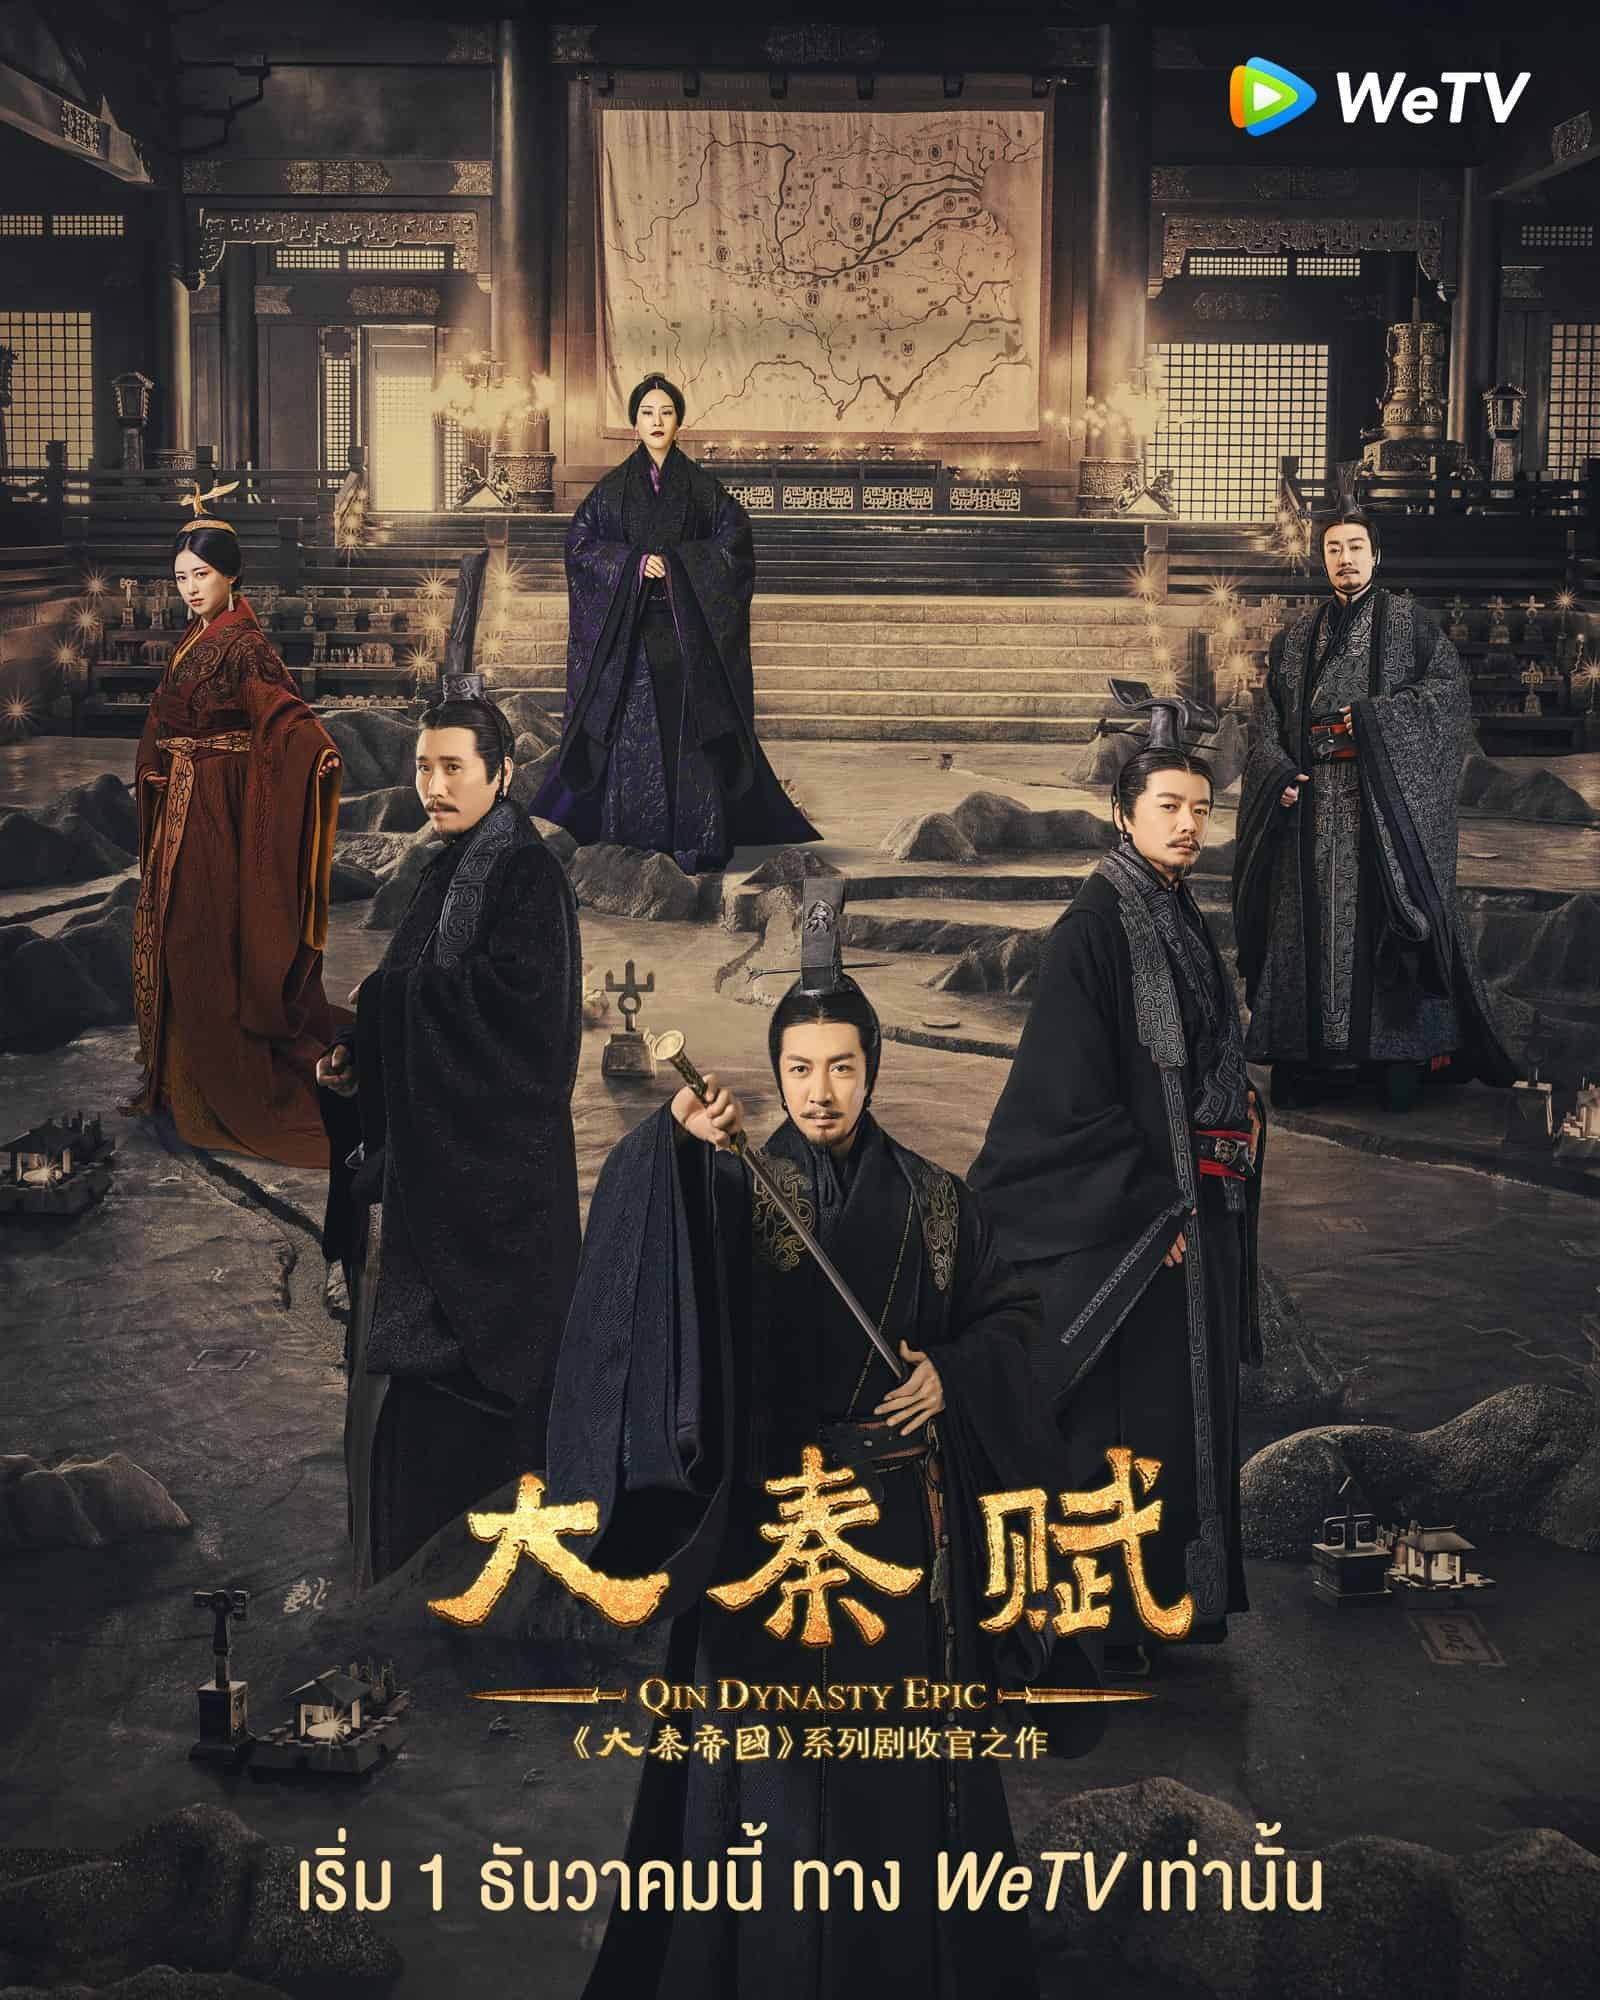 Qin Dynasty Epic: Part 1 (2020) ฉิน กำเนิดแผ่นดินมังกร ภาค รวมแผ่นดินจารึกโลก ซับไทย EP1 – EP40